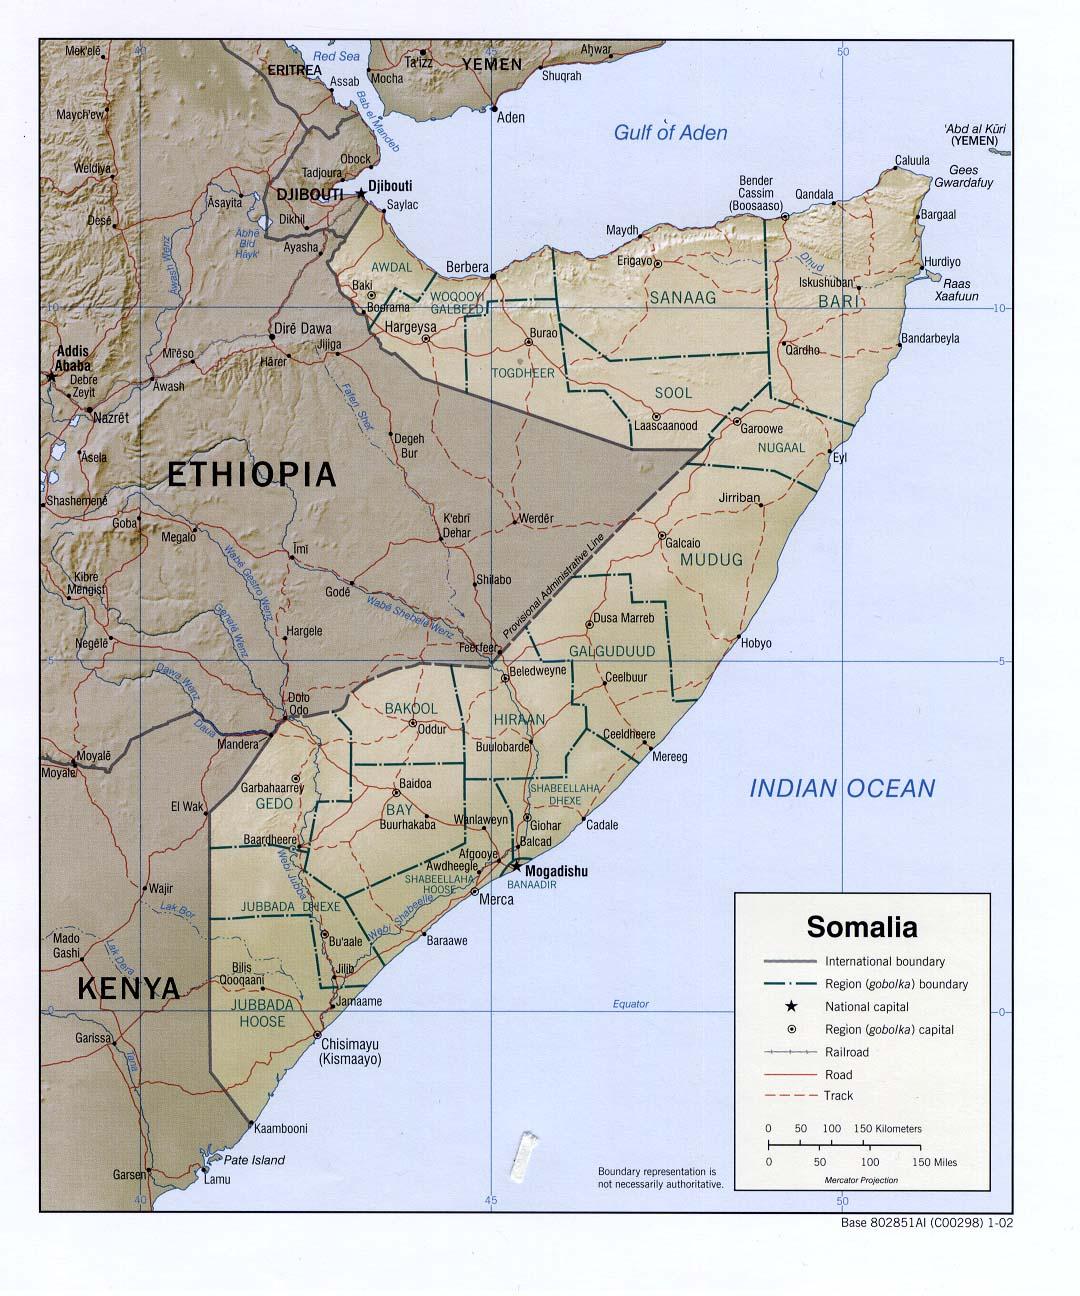 Map fo Somalia (Relief Map) : Worldofmaps.net - online Maps ...